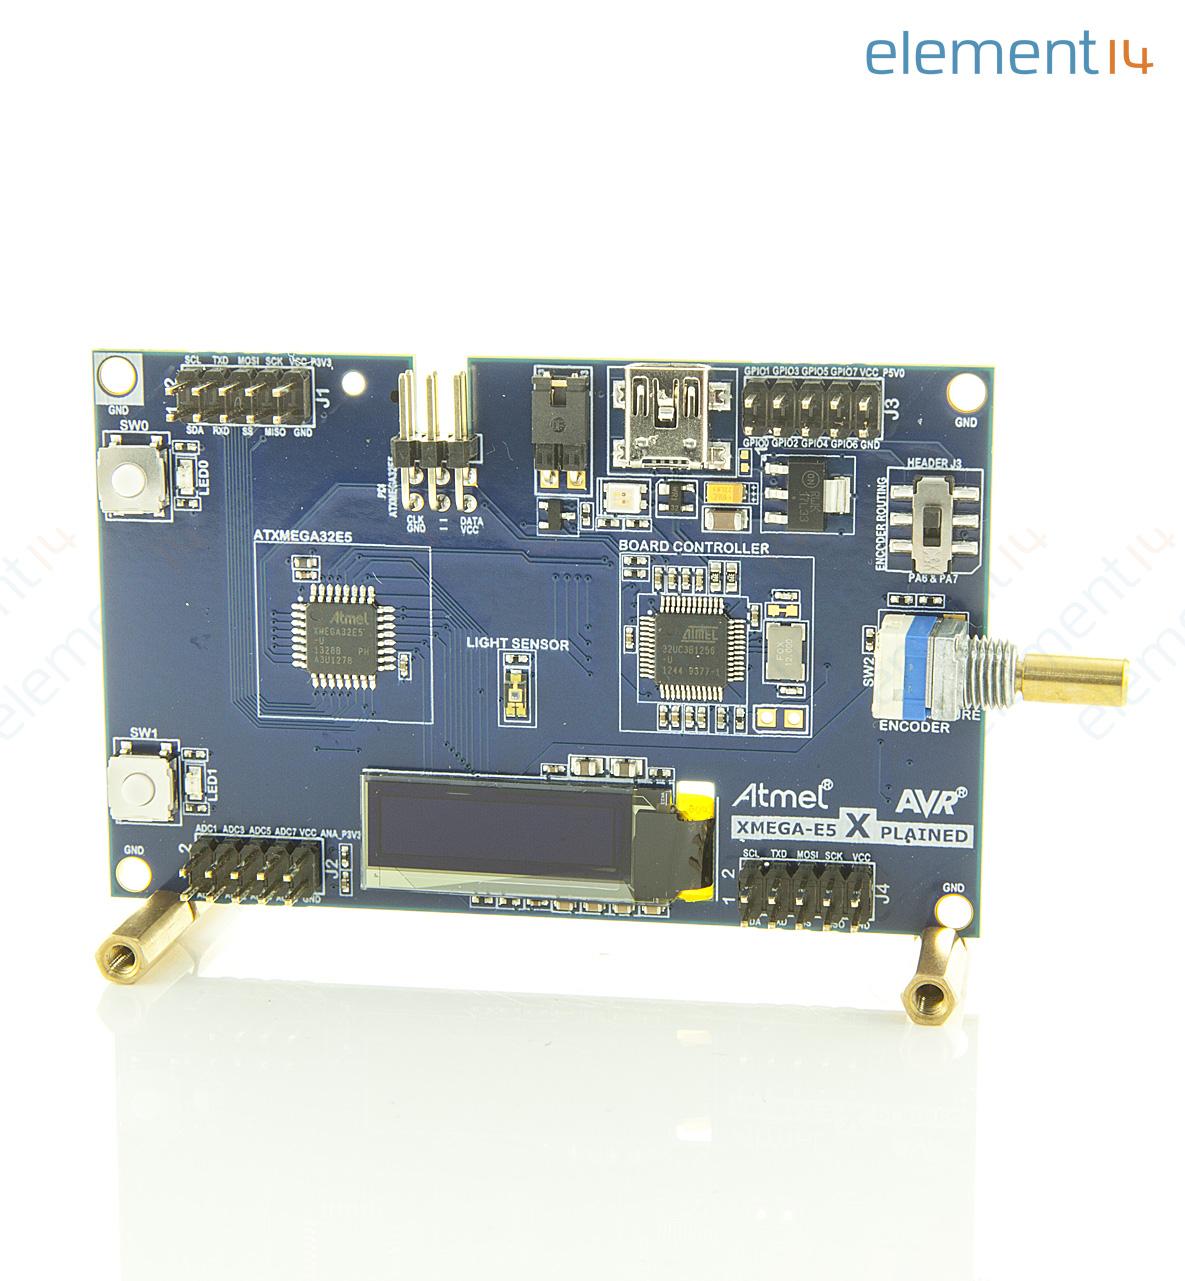 Atxmegae5 Xpld Microchip Development Kit Atxmega32e5 Avr Mcu Atmel Family Expanded Richmedia 346kb En